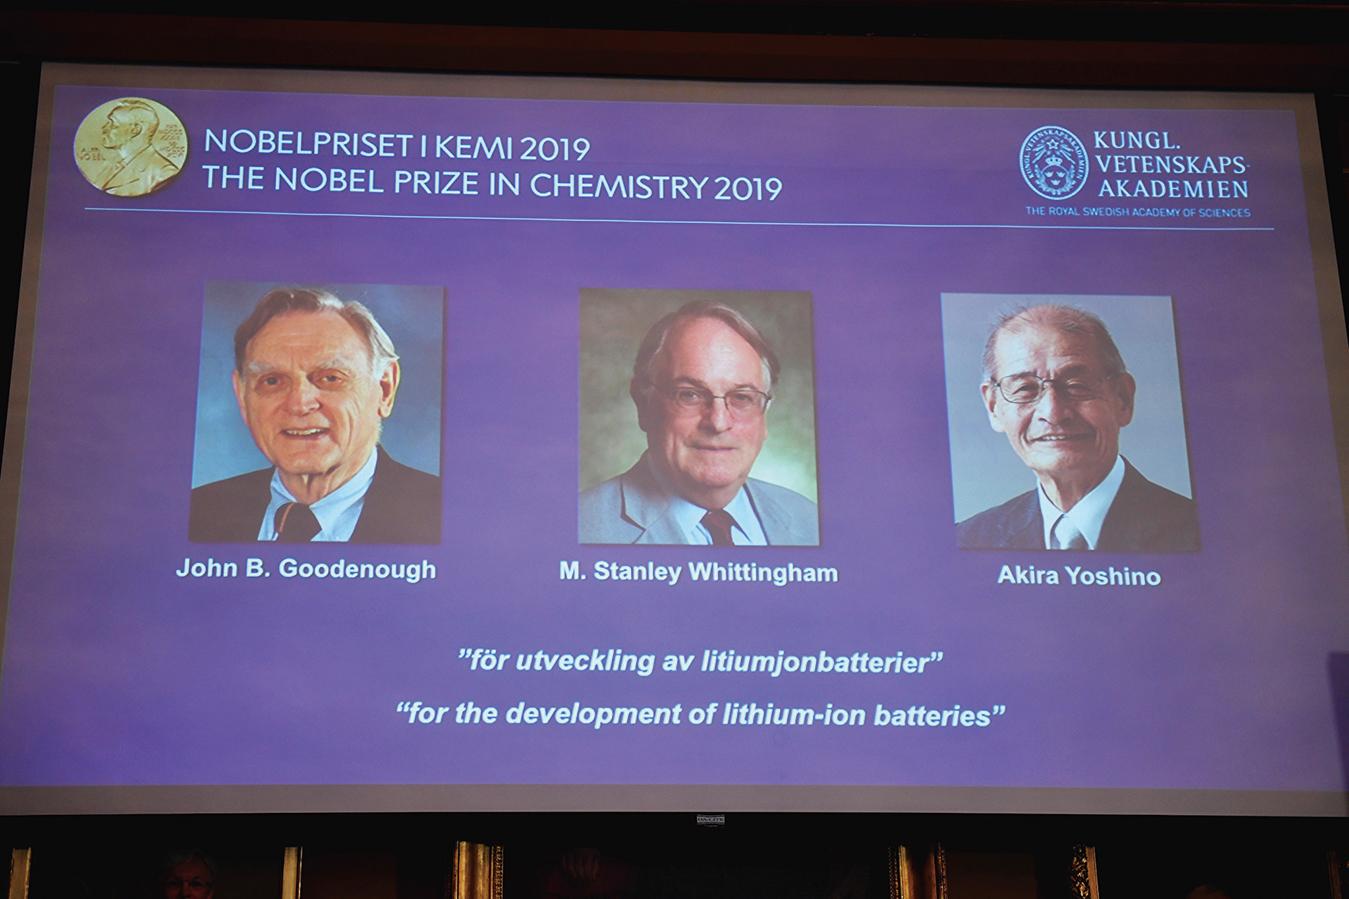 左起古德納夫(Goodenough)、惠廷漢姆(Whittingham)和吉野(Yoshino)獲2019 諾貝爾化學獎。(AFP )